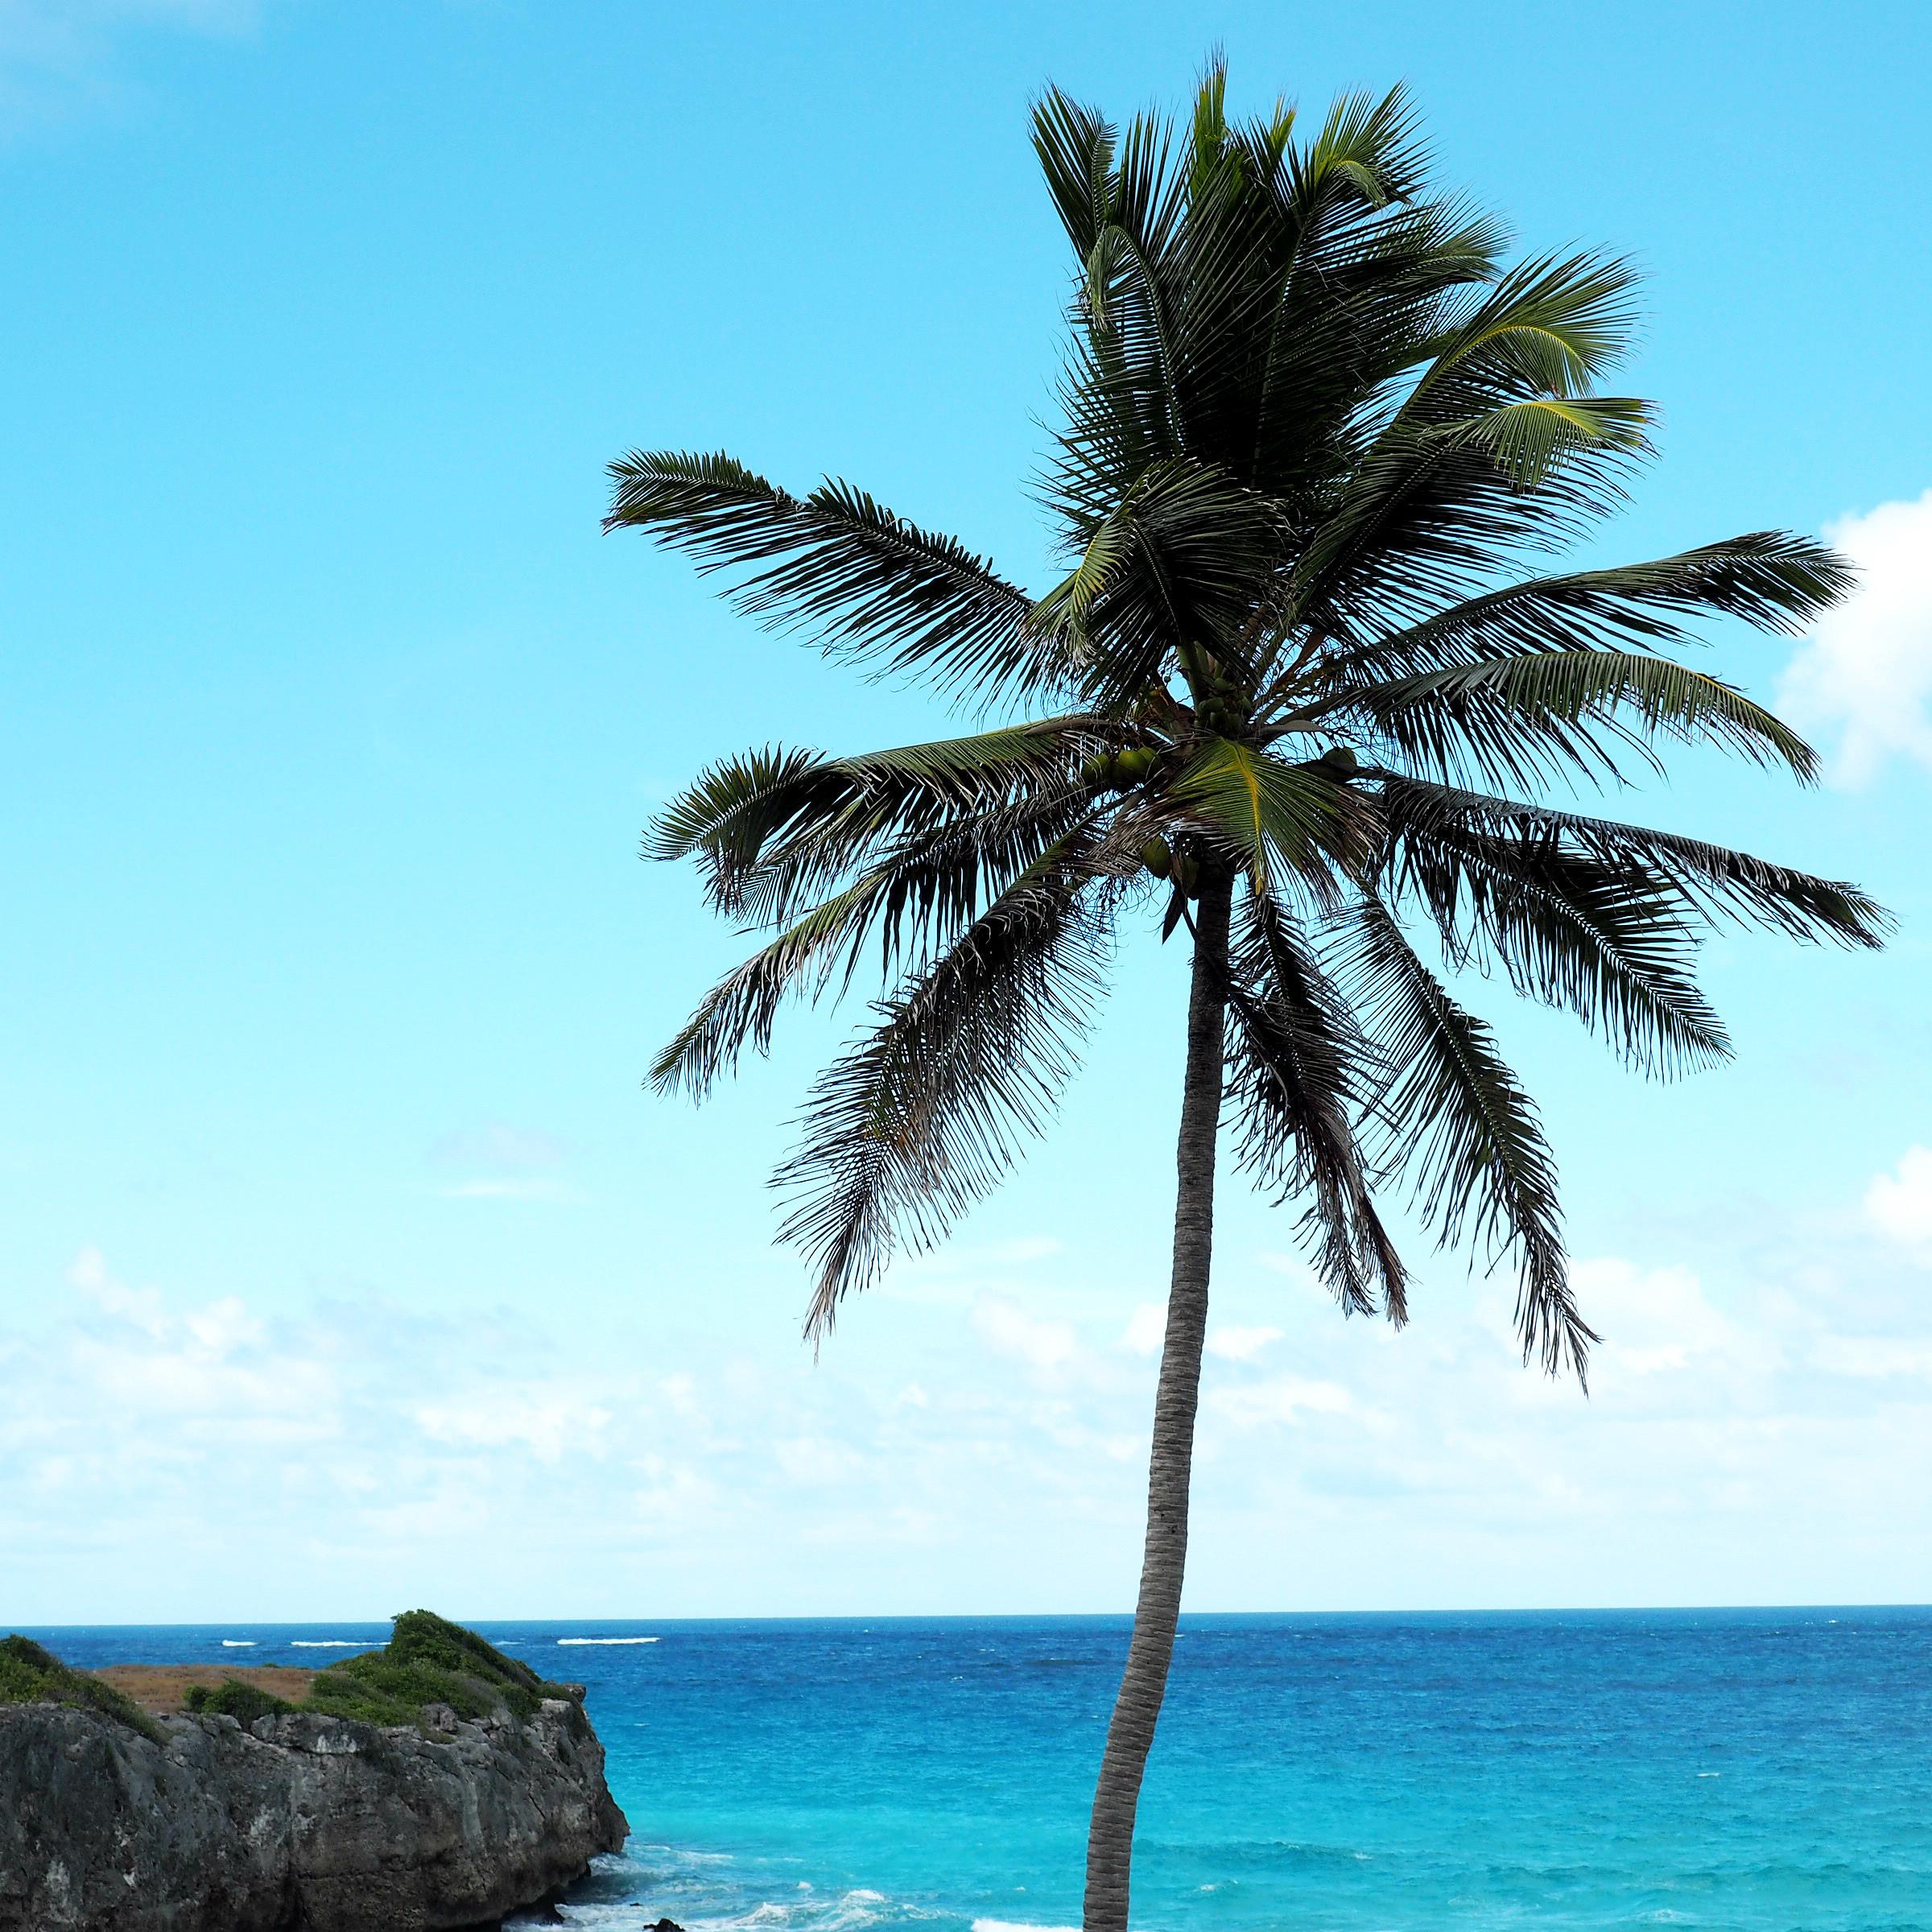 Tommeezjerry-Männerblog-Berlinblog-Fashionblog-Styleblog-Travelblog-Travel-Reiseblog-Reisen-Barbados-Karibik-Carribean-Summer-Sommer-Vacation-13